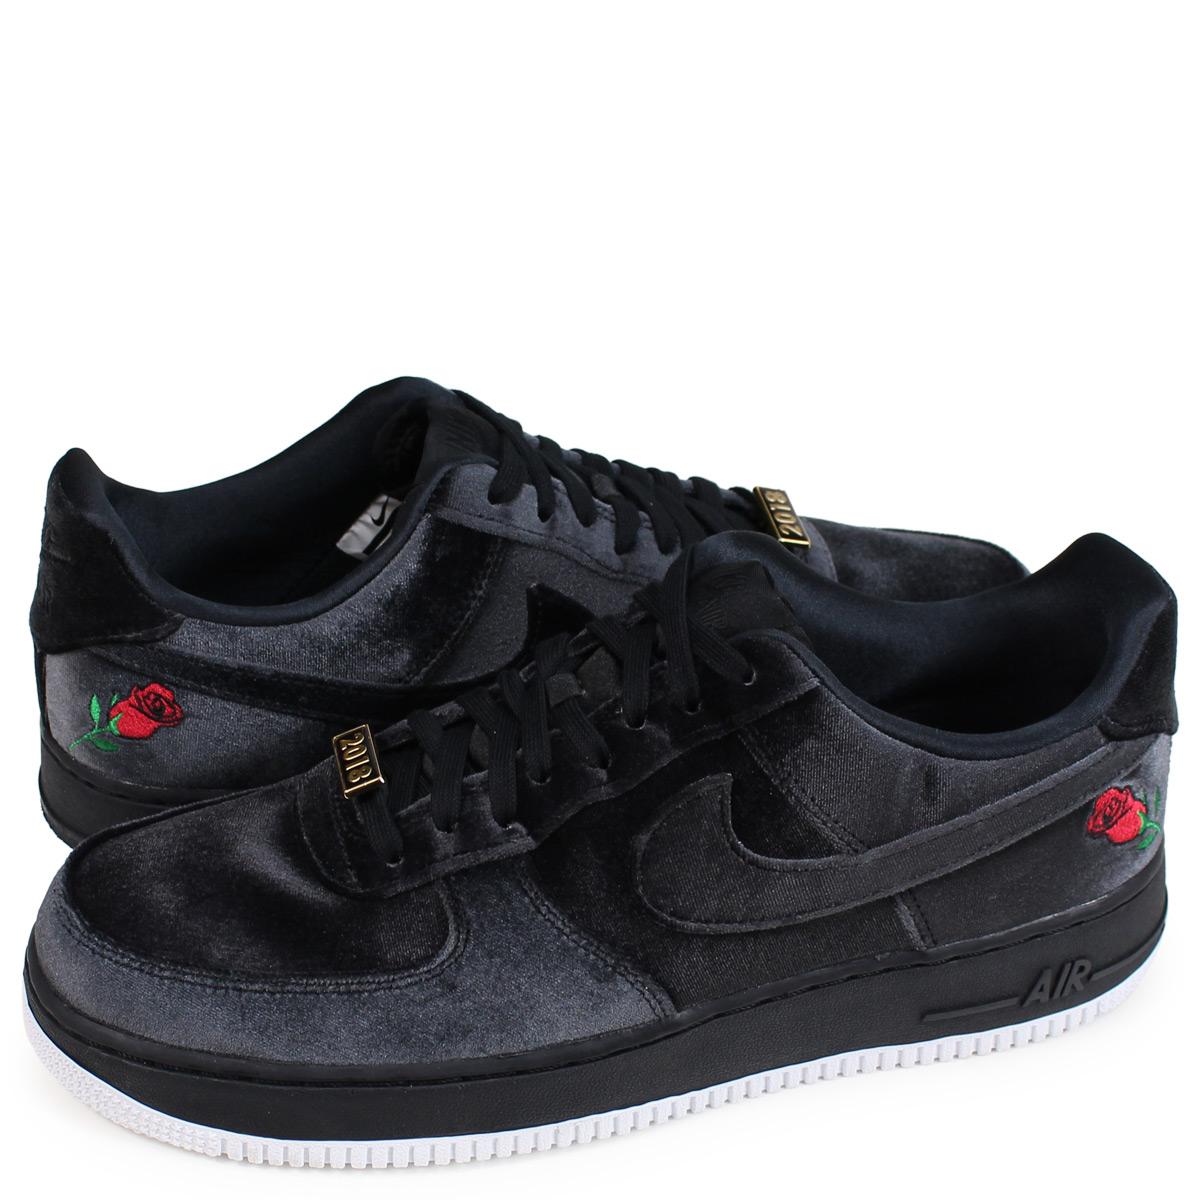 huge discount f744a c25d6 ALLSPORTS Nike NIKE air force 1 sneakers men AIR FORCE 1 07 QS VELVET  black AH8462-003  Rakuten Global Market